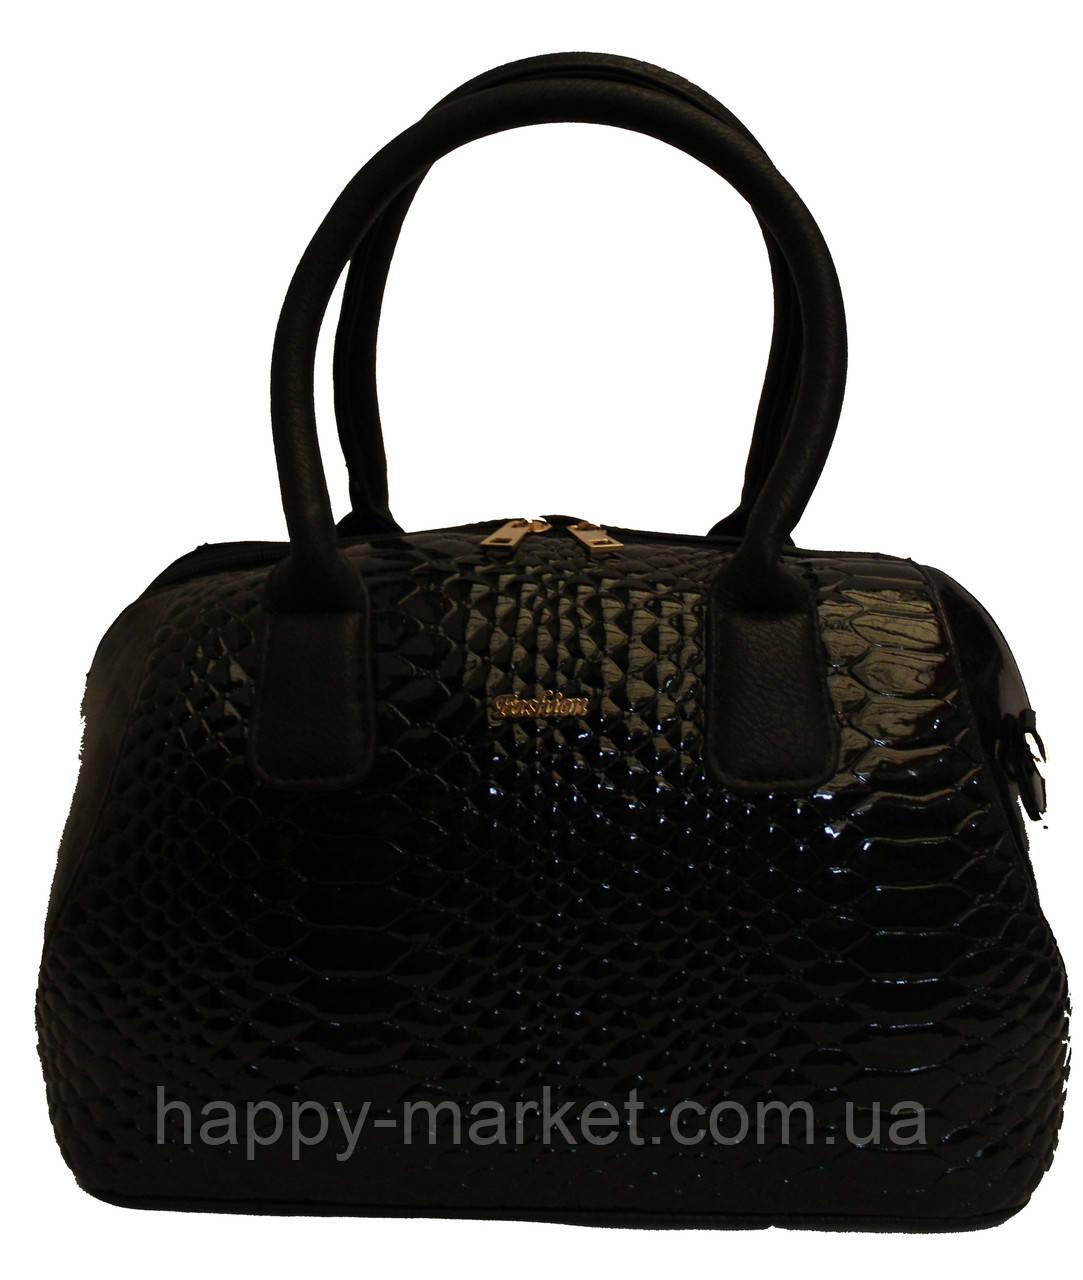 Сумка стильная Саквояж Боченок каркасная Fashion 17-1430-4